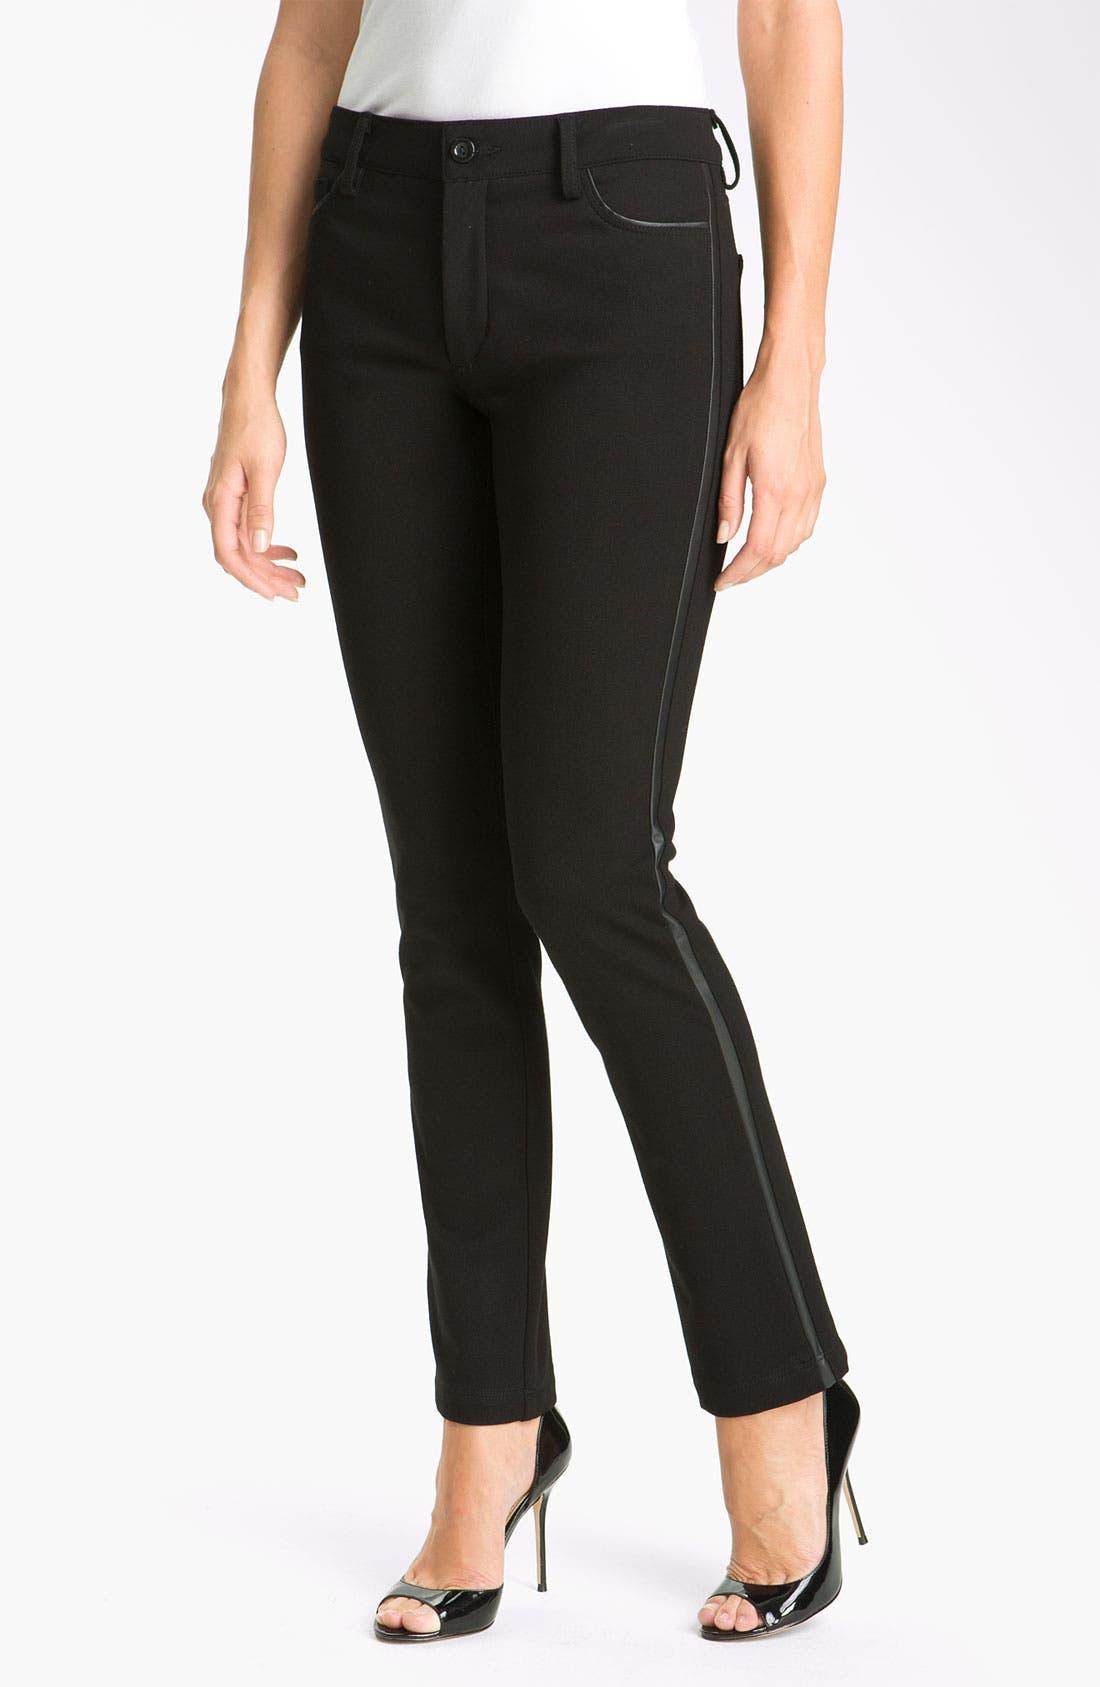 Main Image - NYDJ 'Pamela' Skinny Stretch Ponte Pants